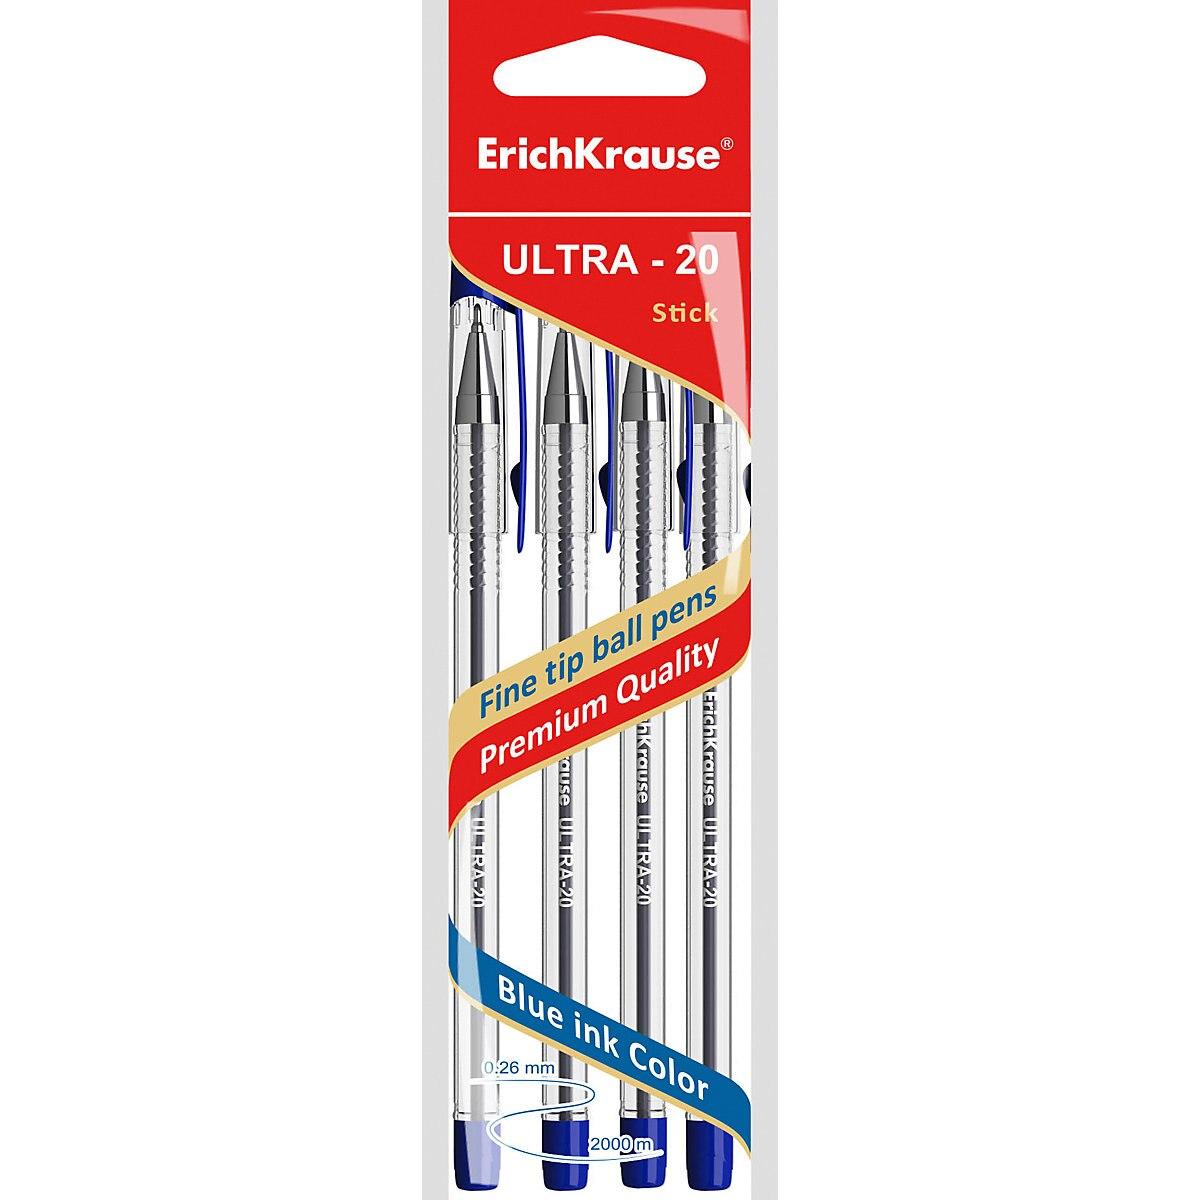 ERICHKRAUSE Pen Grips 11174003 Pens ball the gel pencils writing supplies MTpromo 6pcs ball game props body paint pen